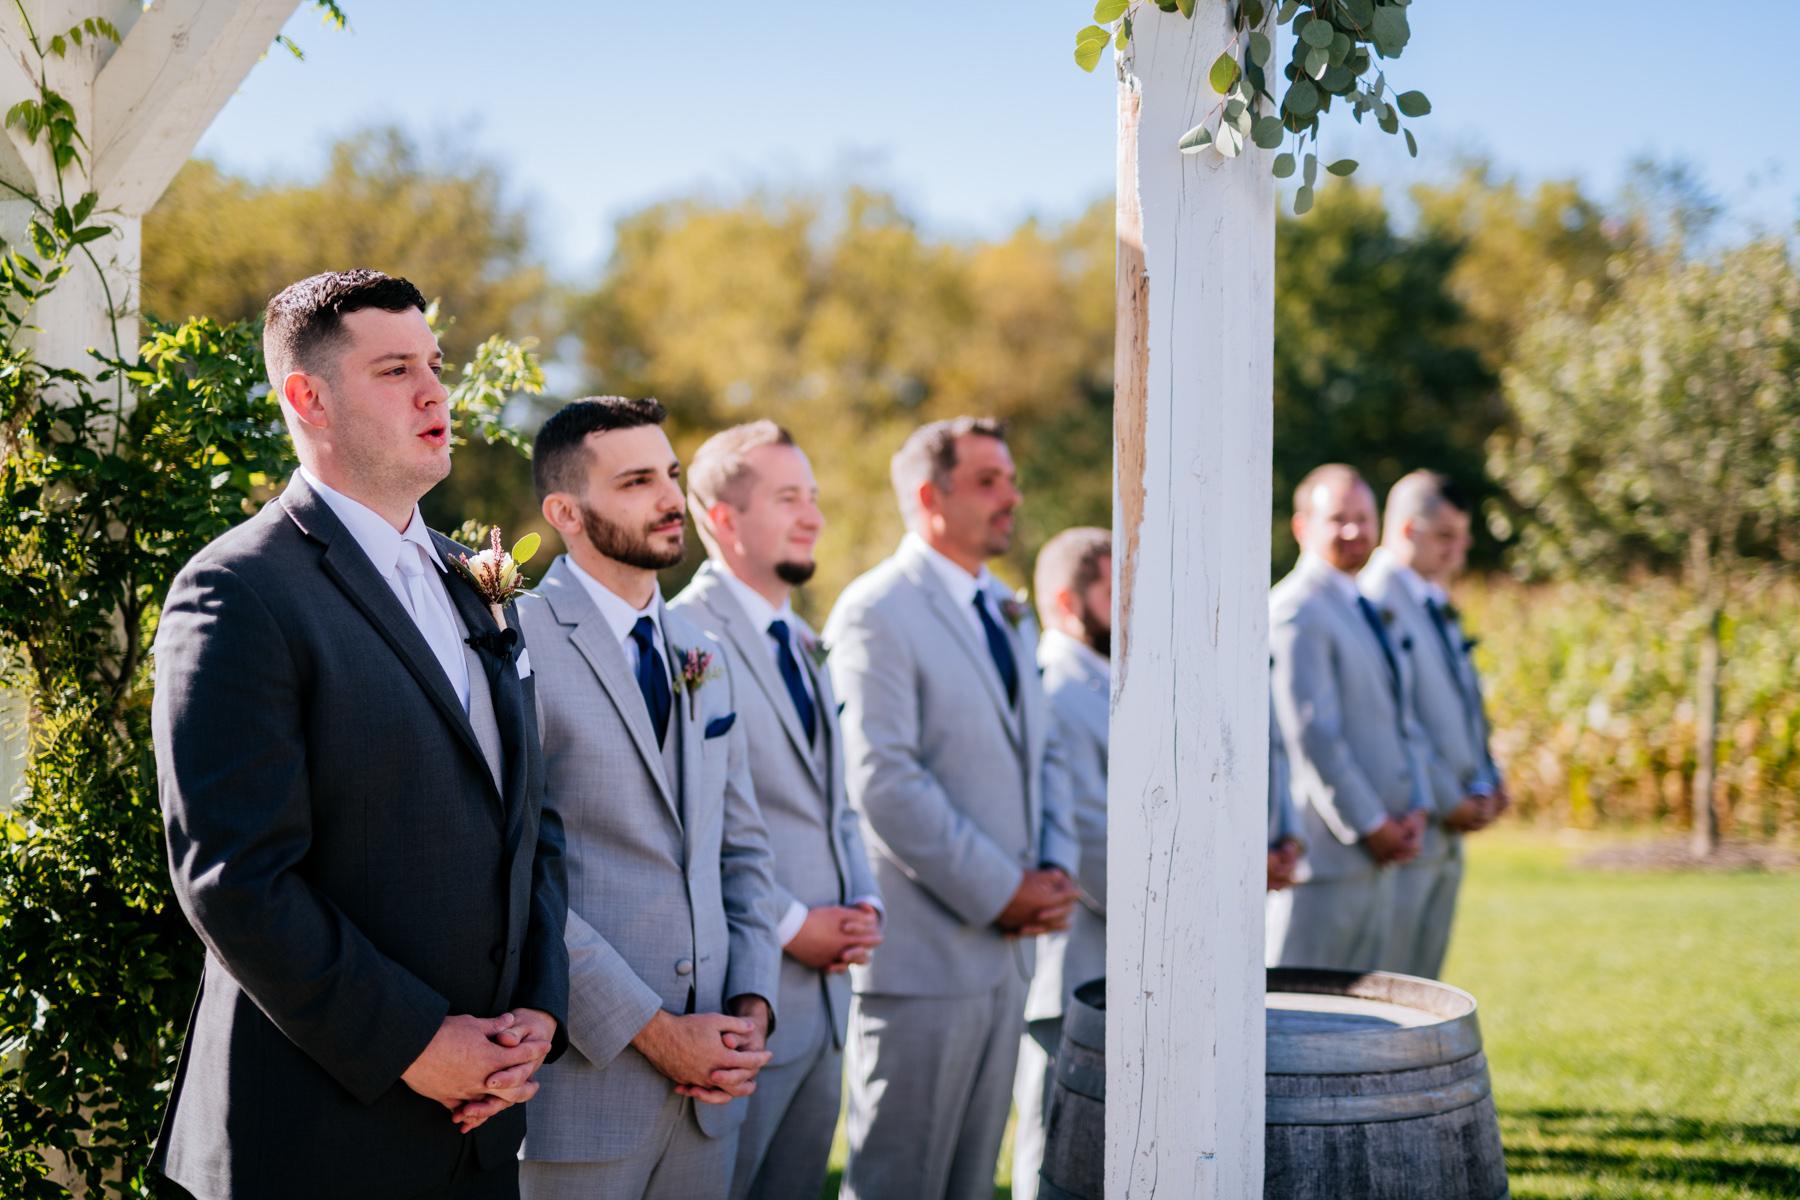 emotion groom during wedding ceremony